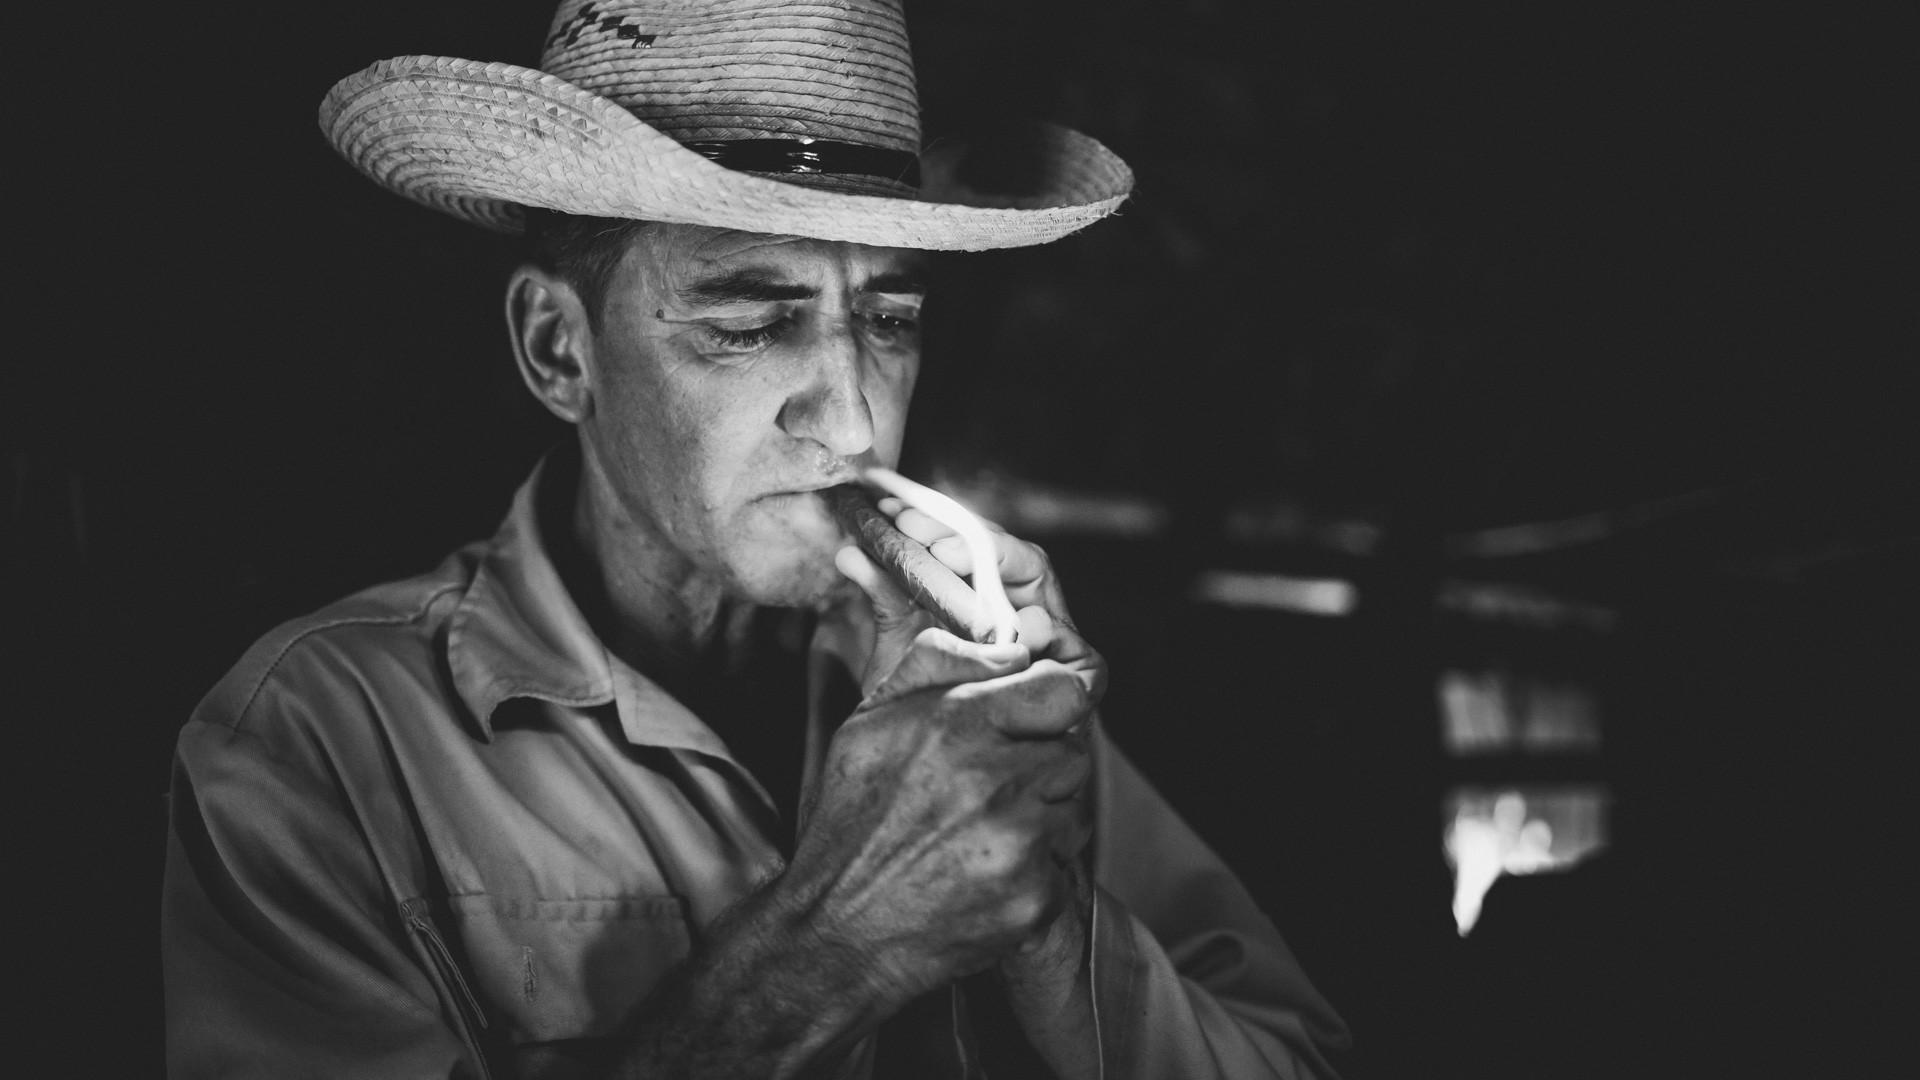 Damien-Dohmen-Photographe-Cuba-10